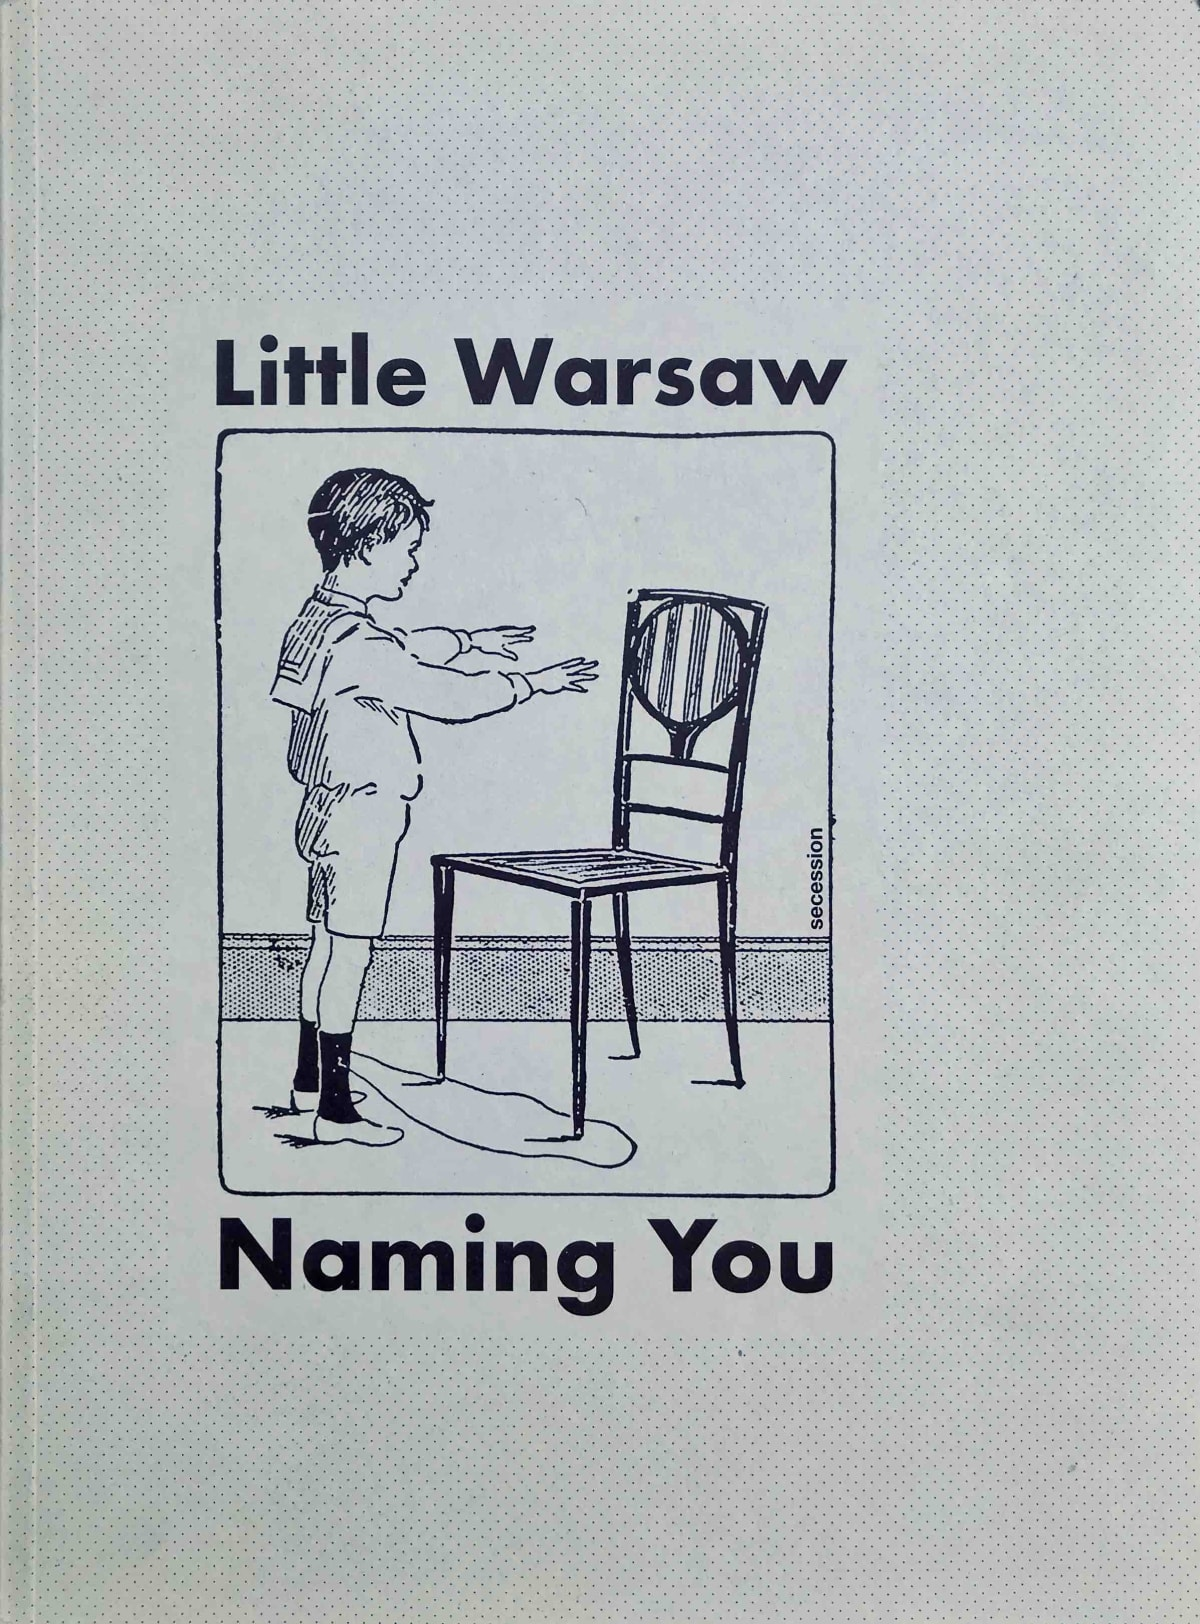 little_warsaw_naming_you_publication_2014